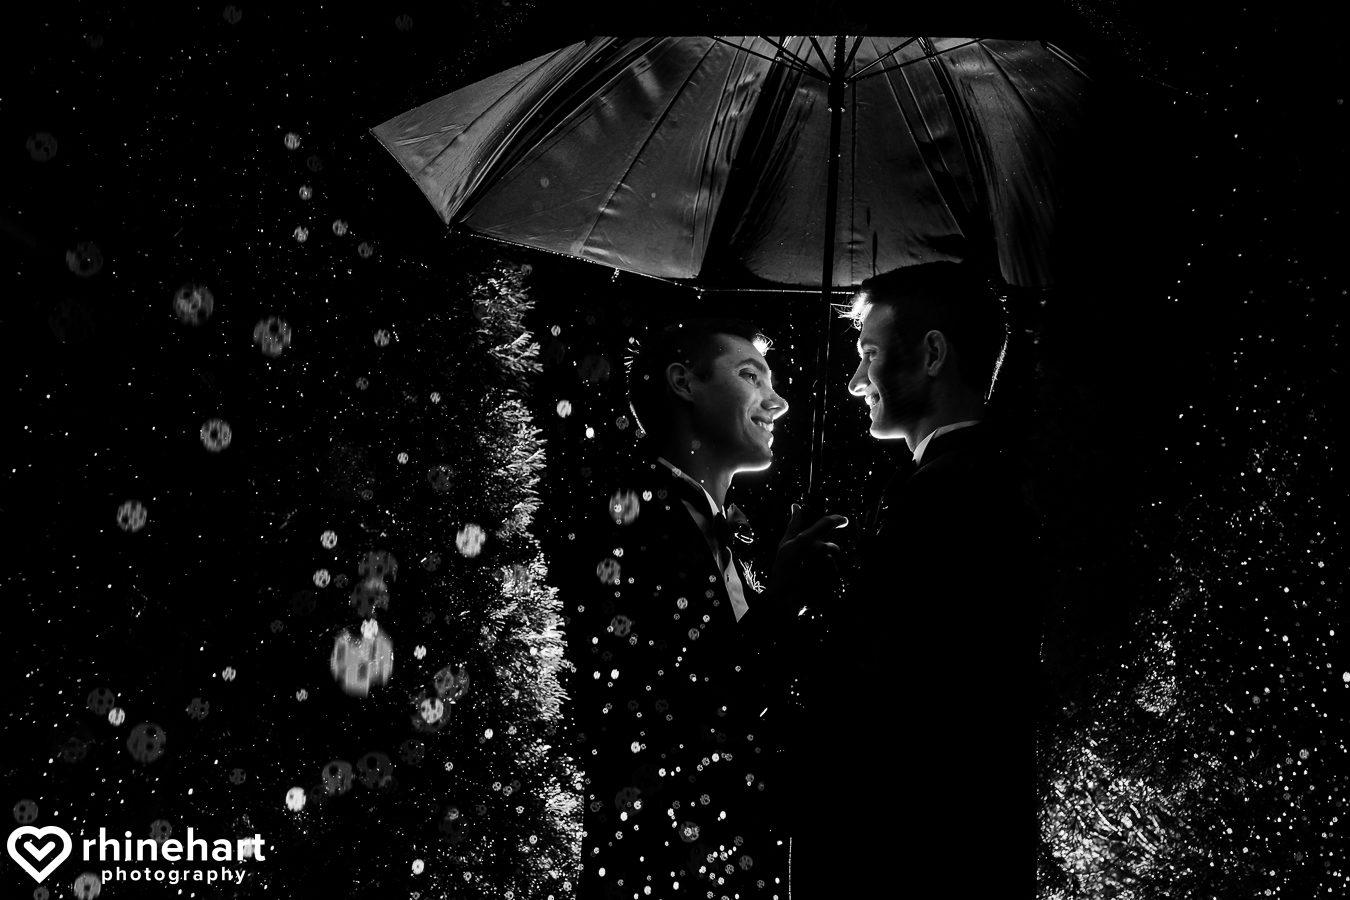 ledges-hotel-wedding-photographers-poconos-hawley-pa-best-creative-unique-artistic-fun-romantic-351